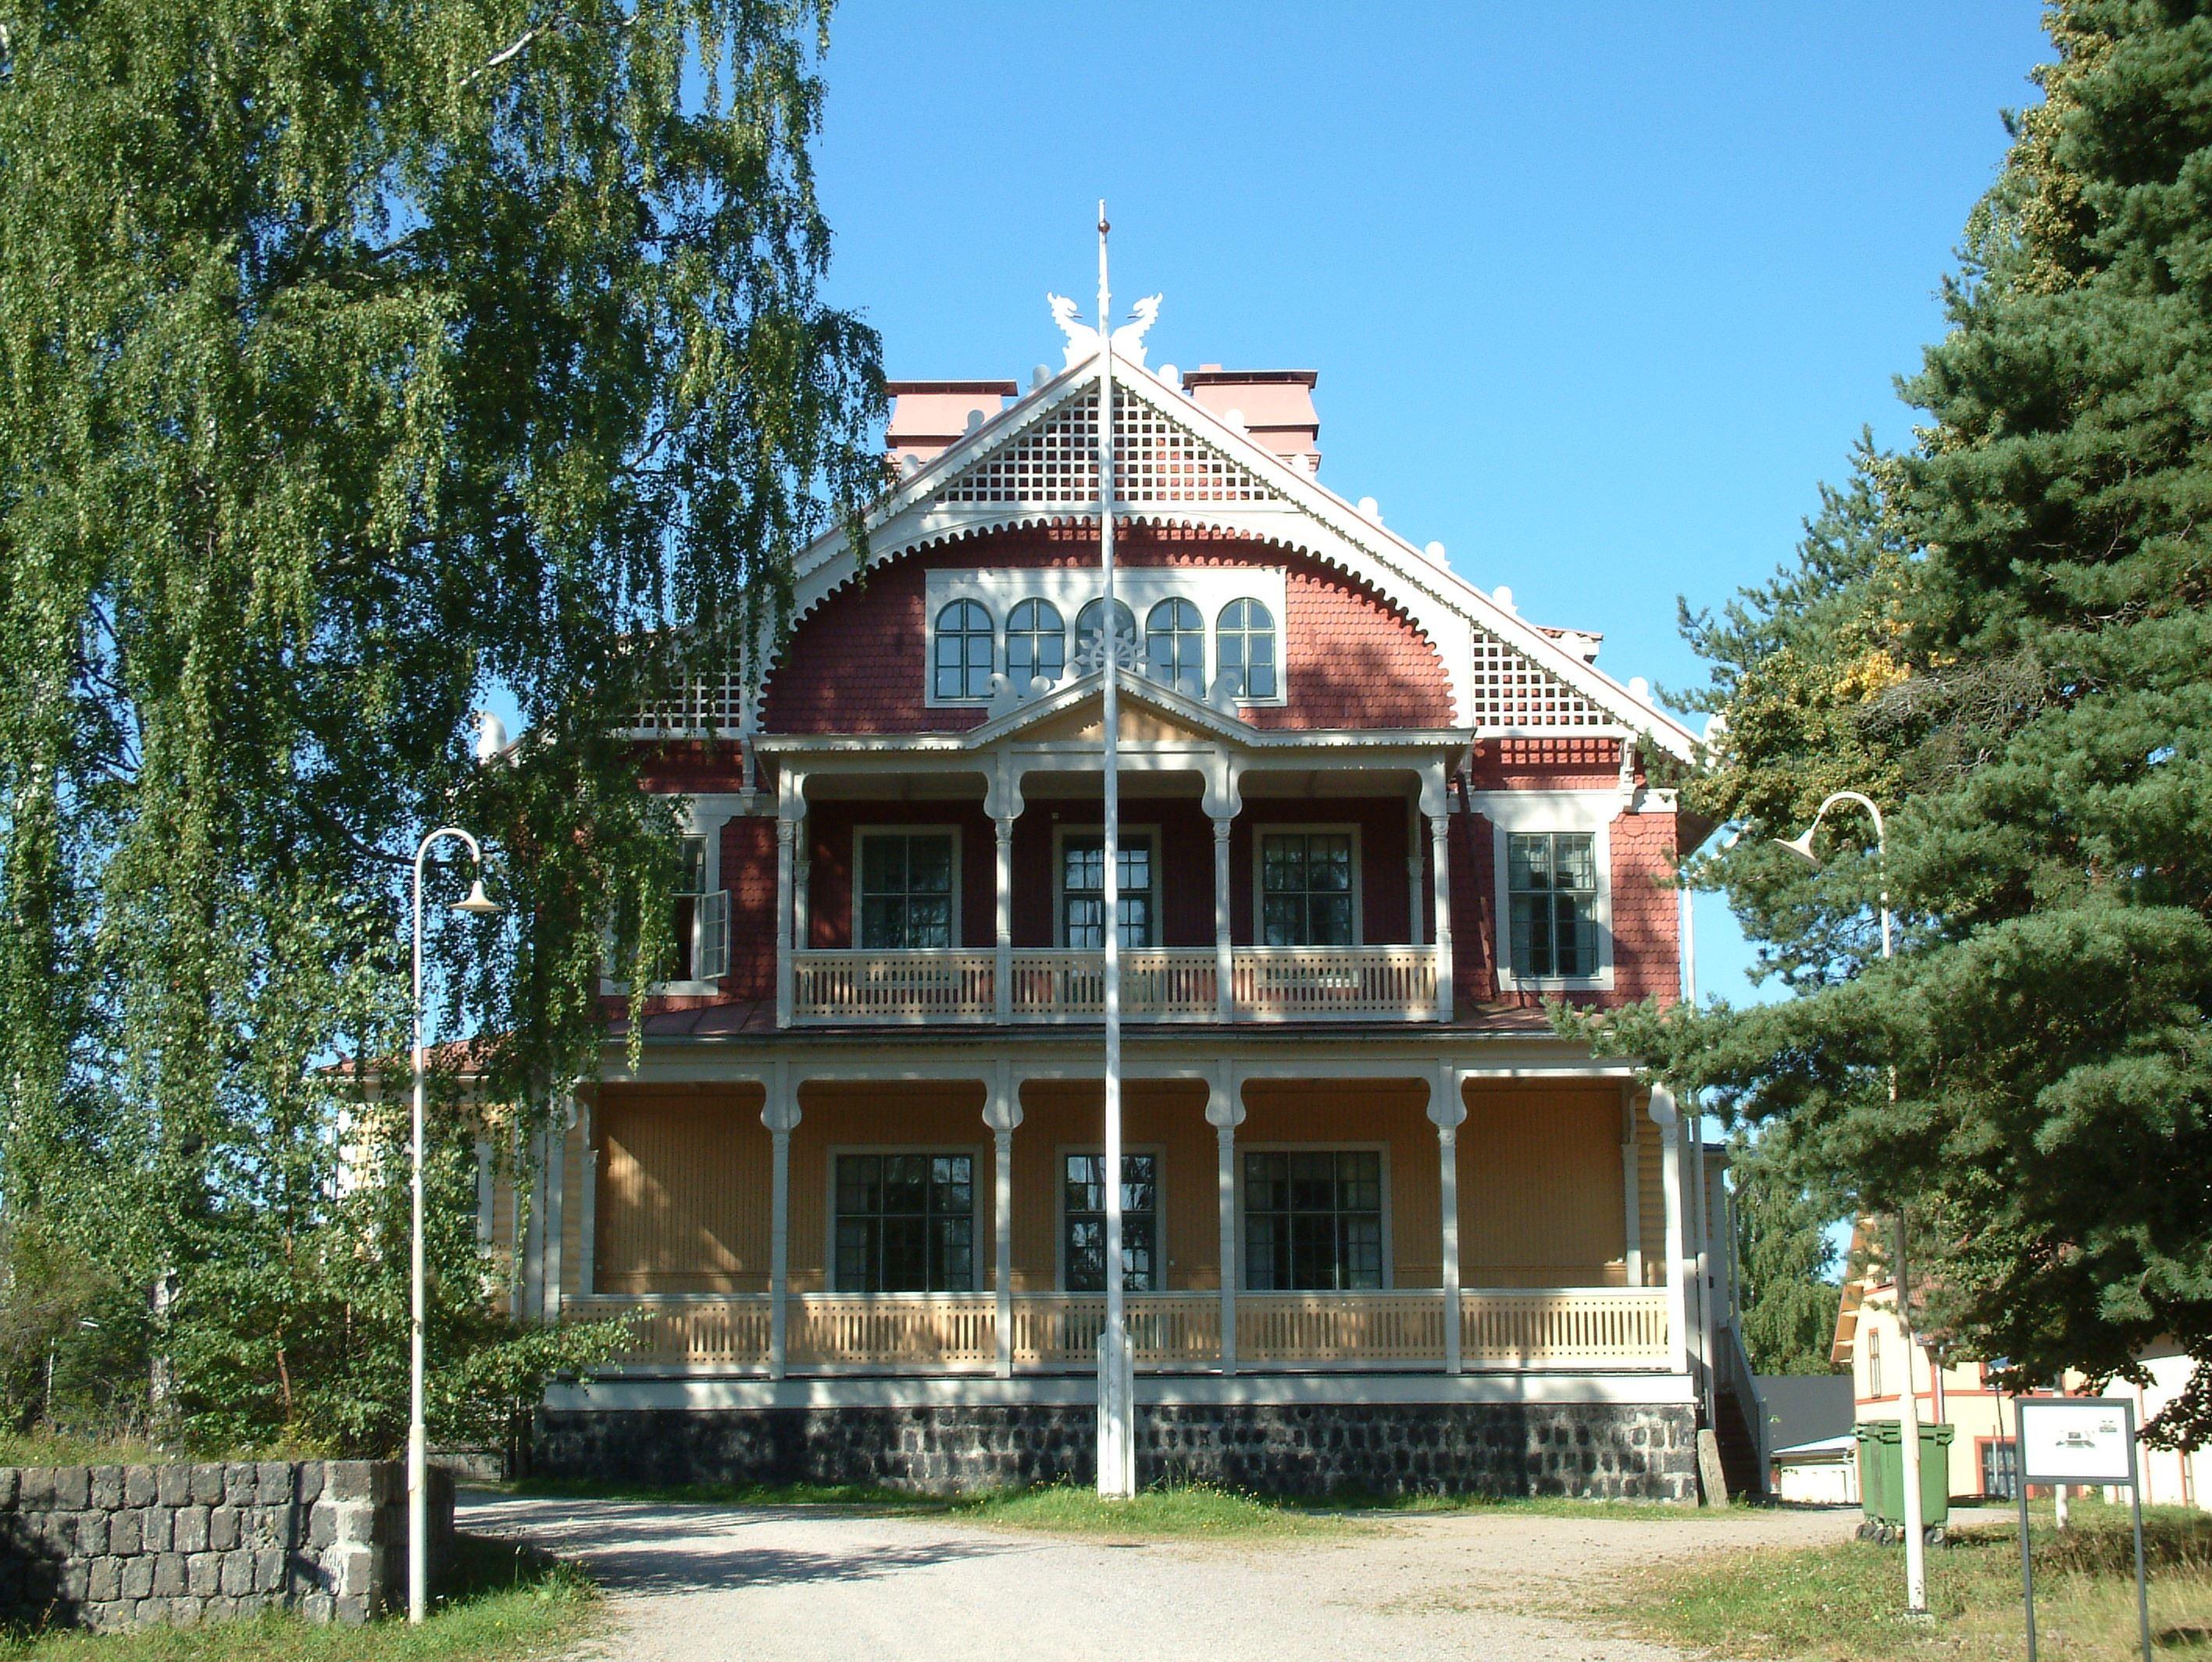 Vandring i Sandviken